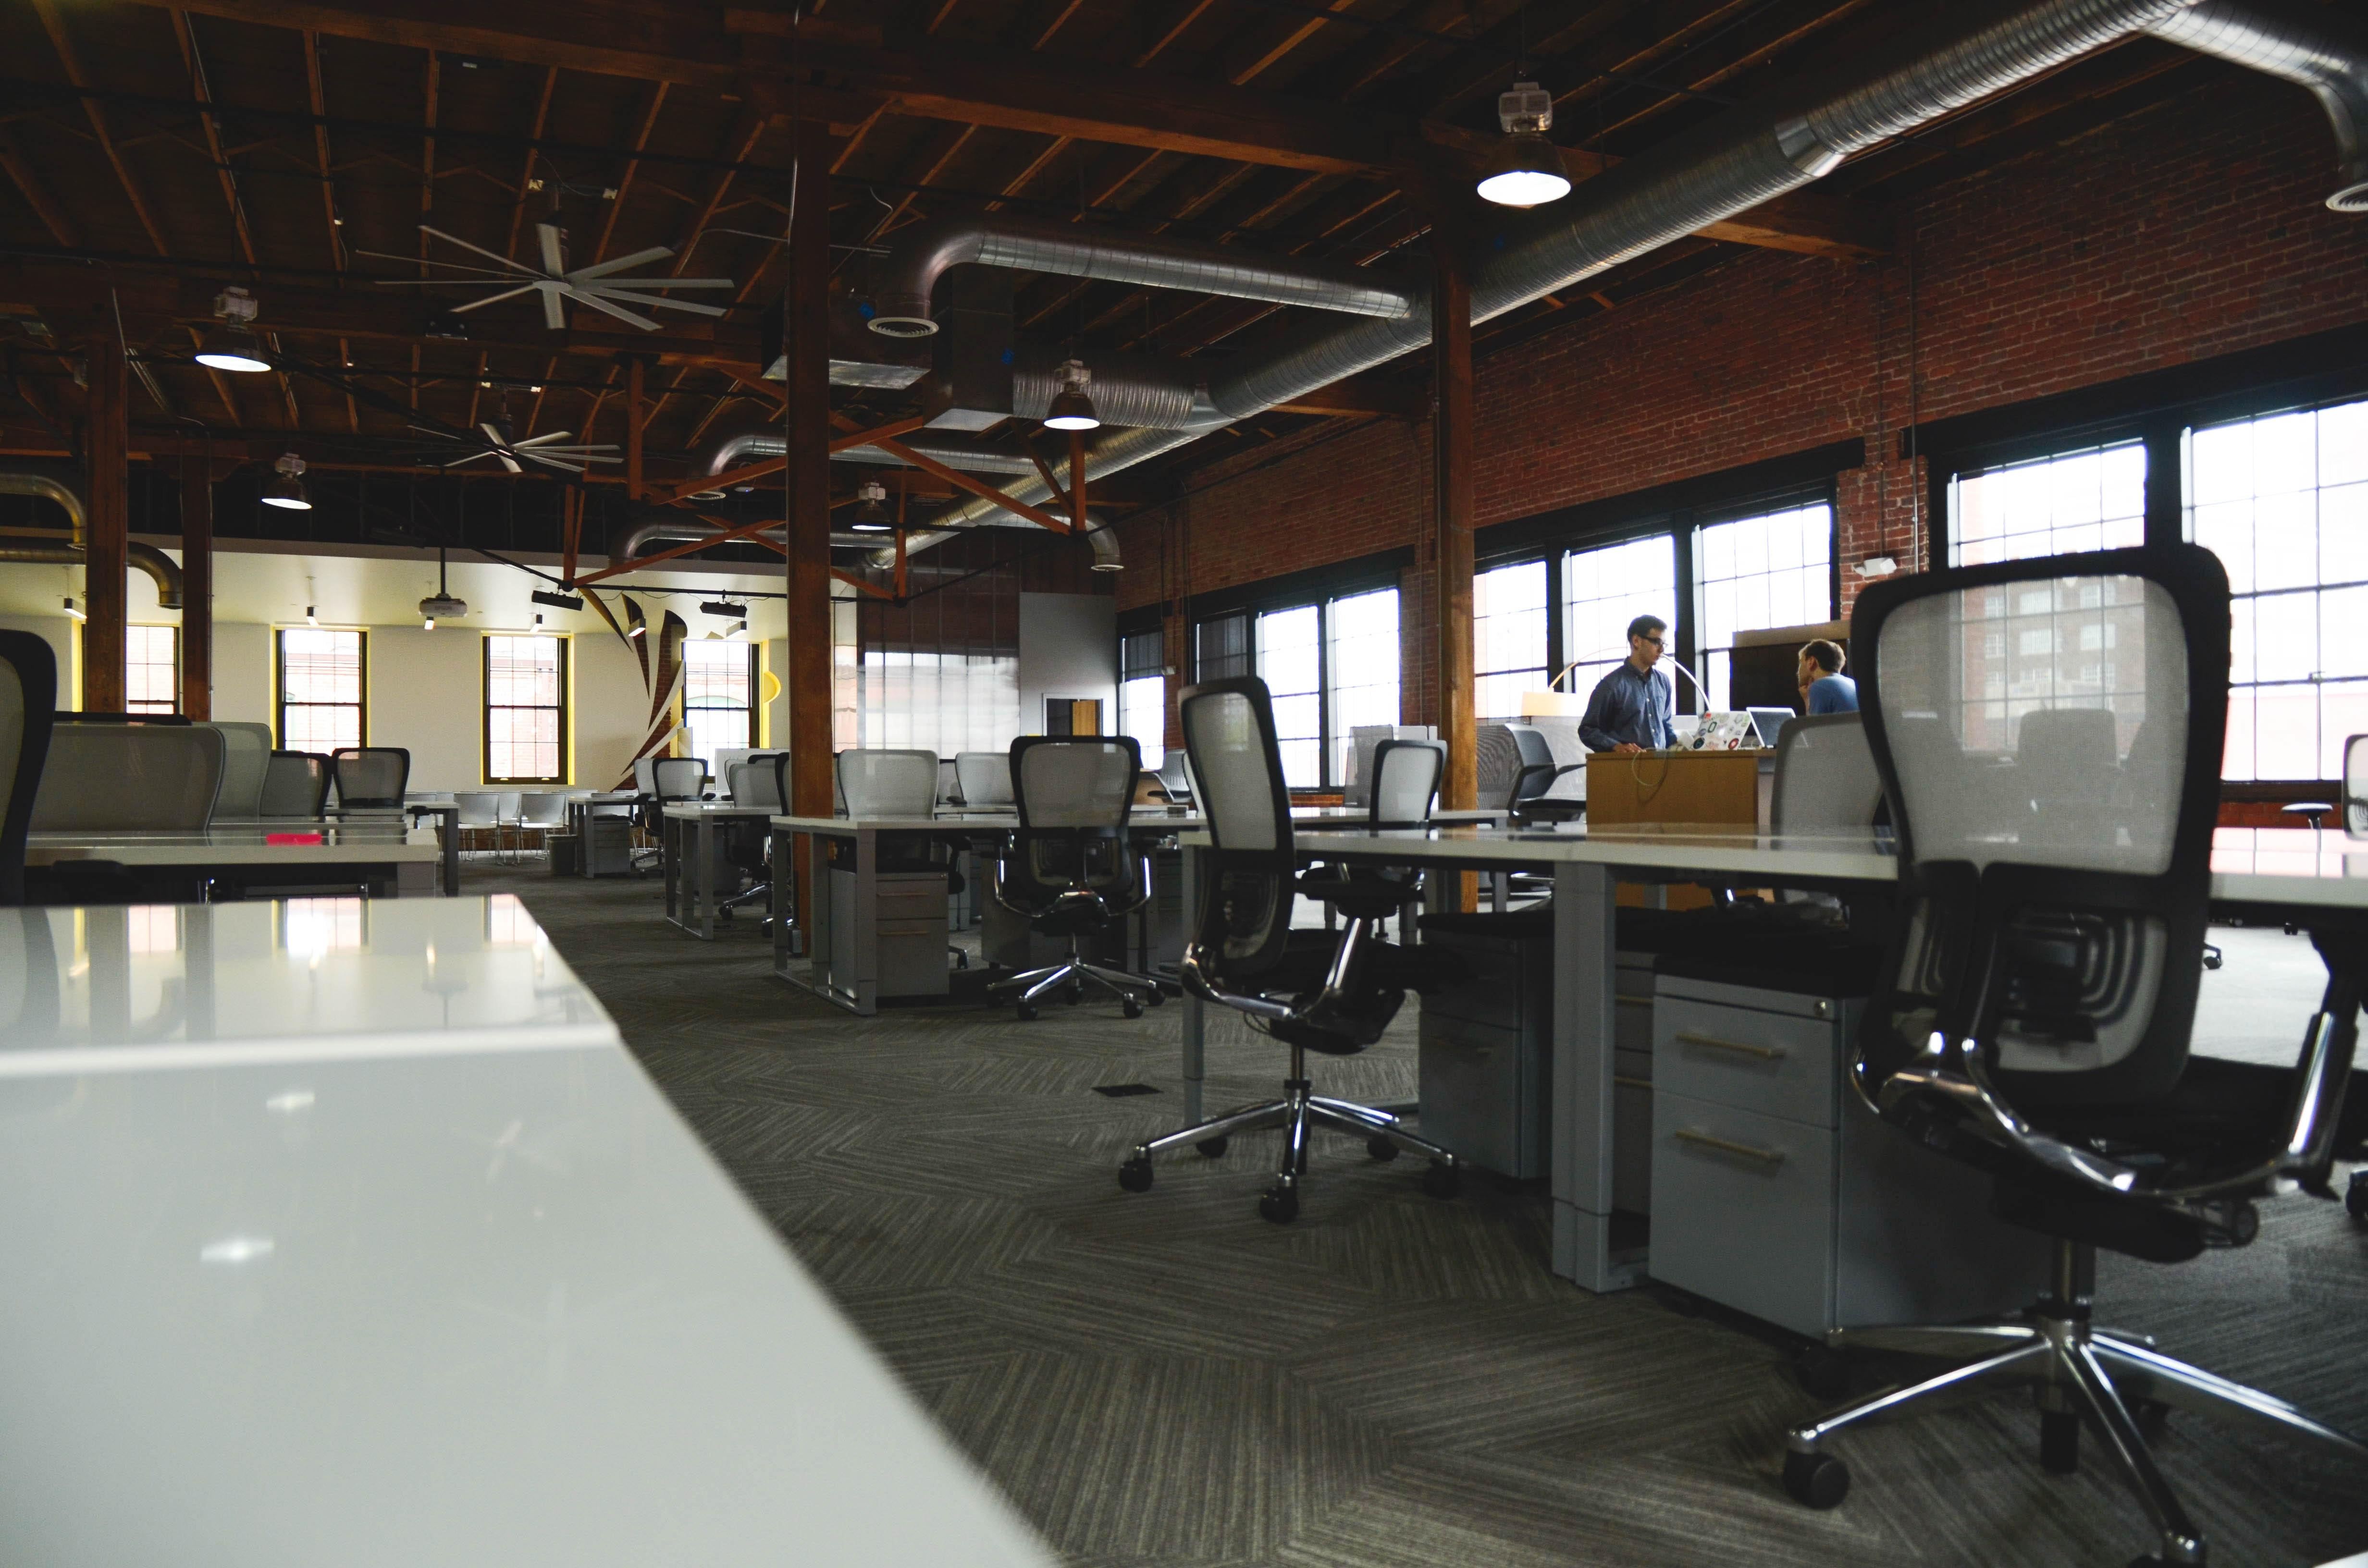 Brilliant Office Images Pexels Free Stock Photos Largest Home Design Picture Inspirations Pitcheantrous